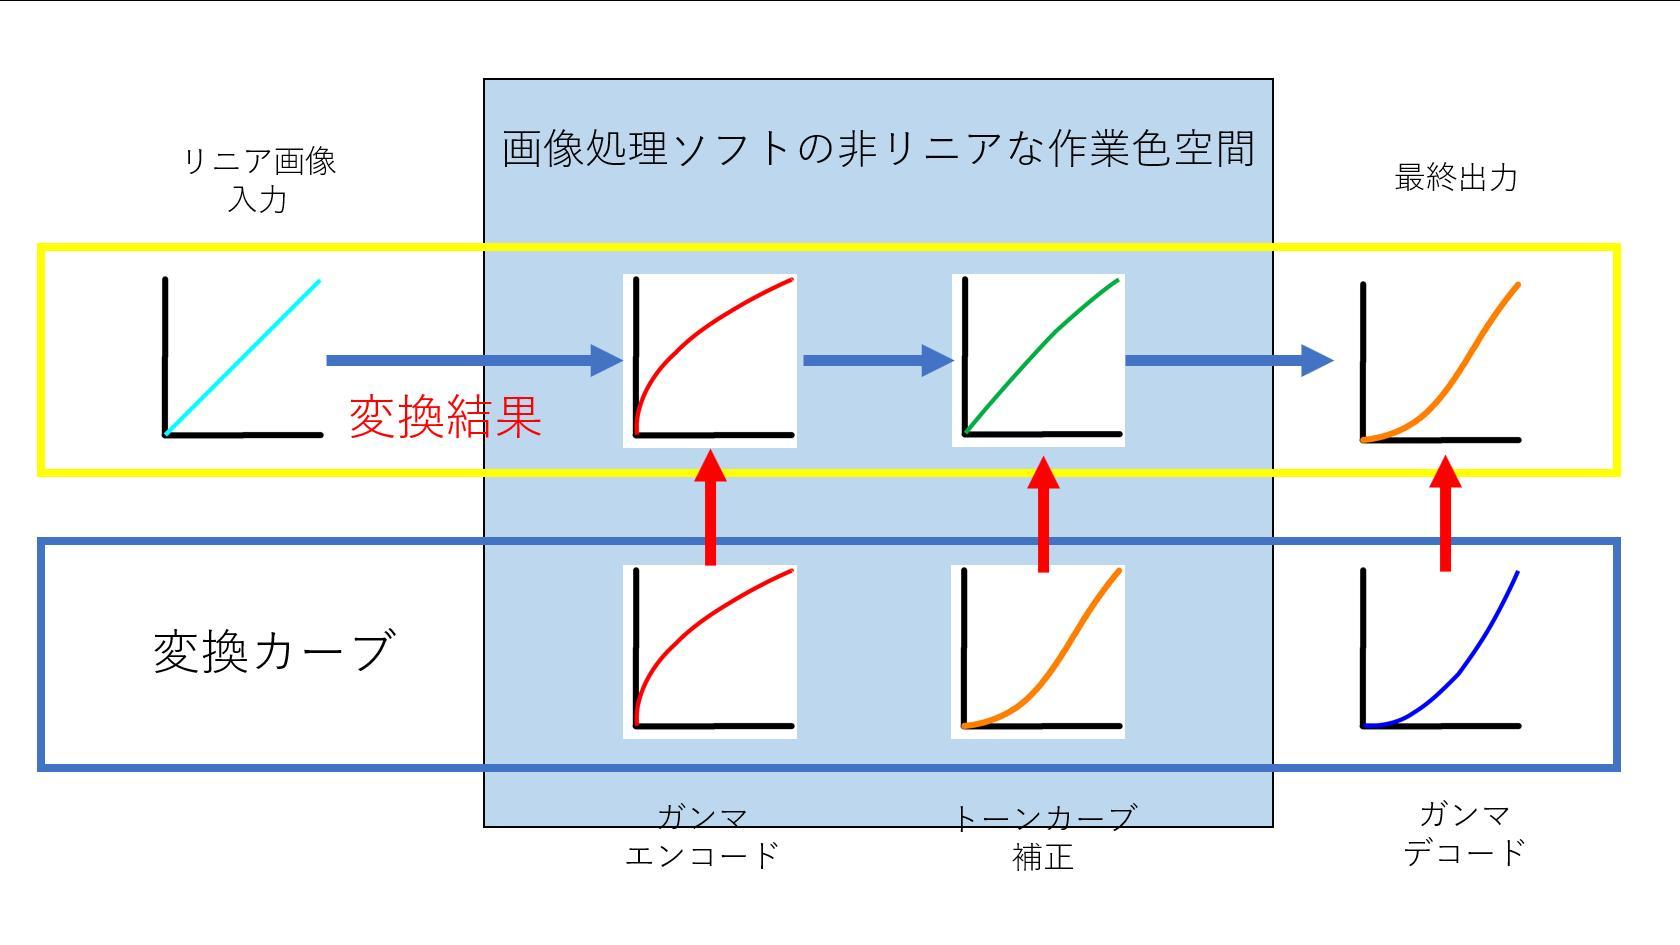 f:id:yasuo_ssi:20201111182608j:plain